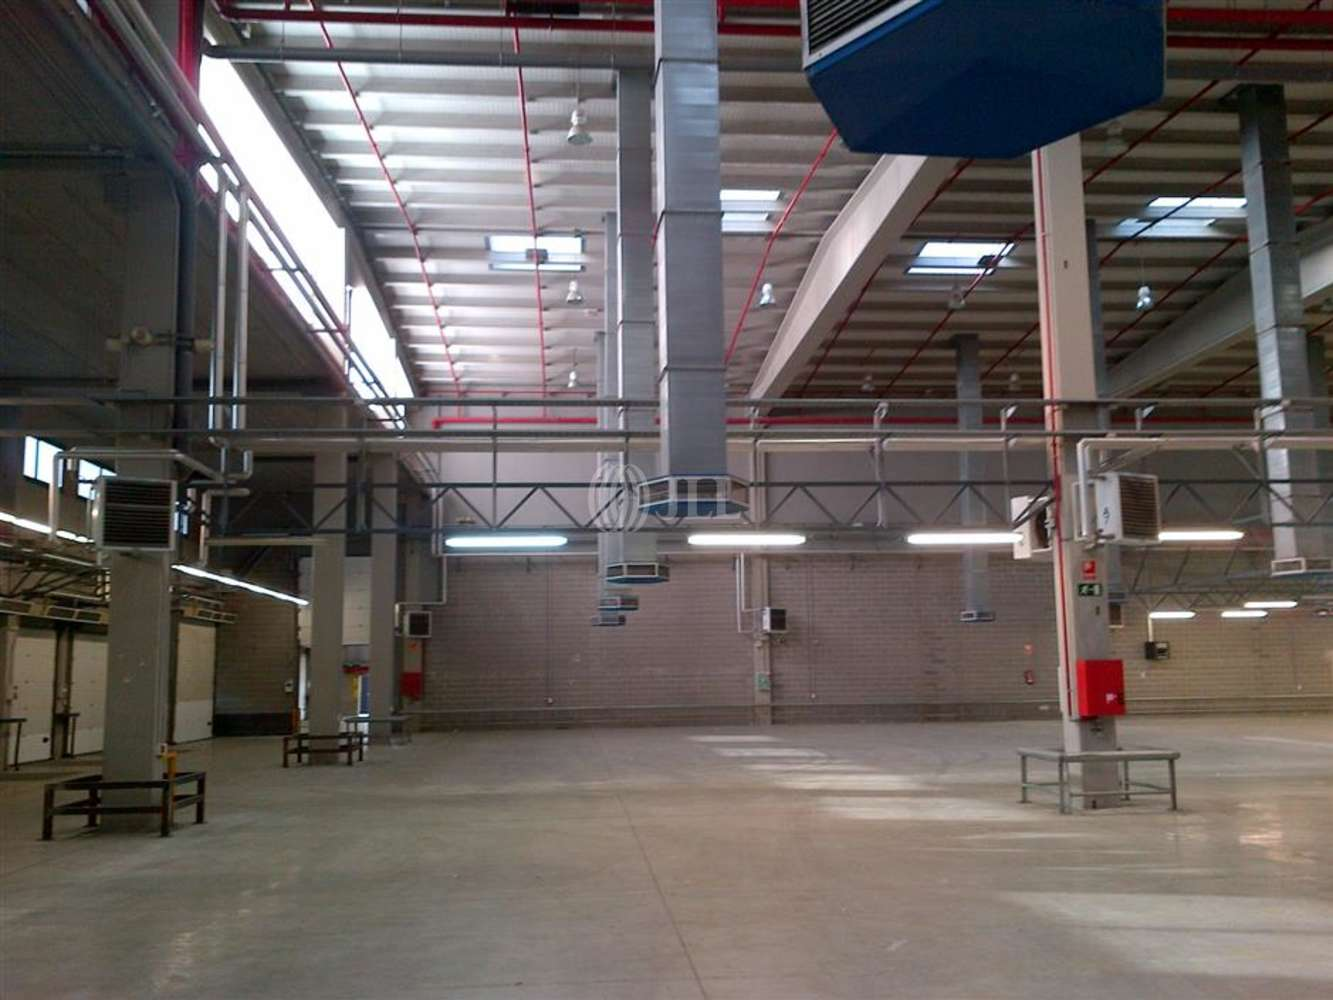 Naves industriales y logísticas Barcelona, 08040 - Nave Logistica - B0059 - PI PARC LOGISTIC ZONA FRANCA - 11506